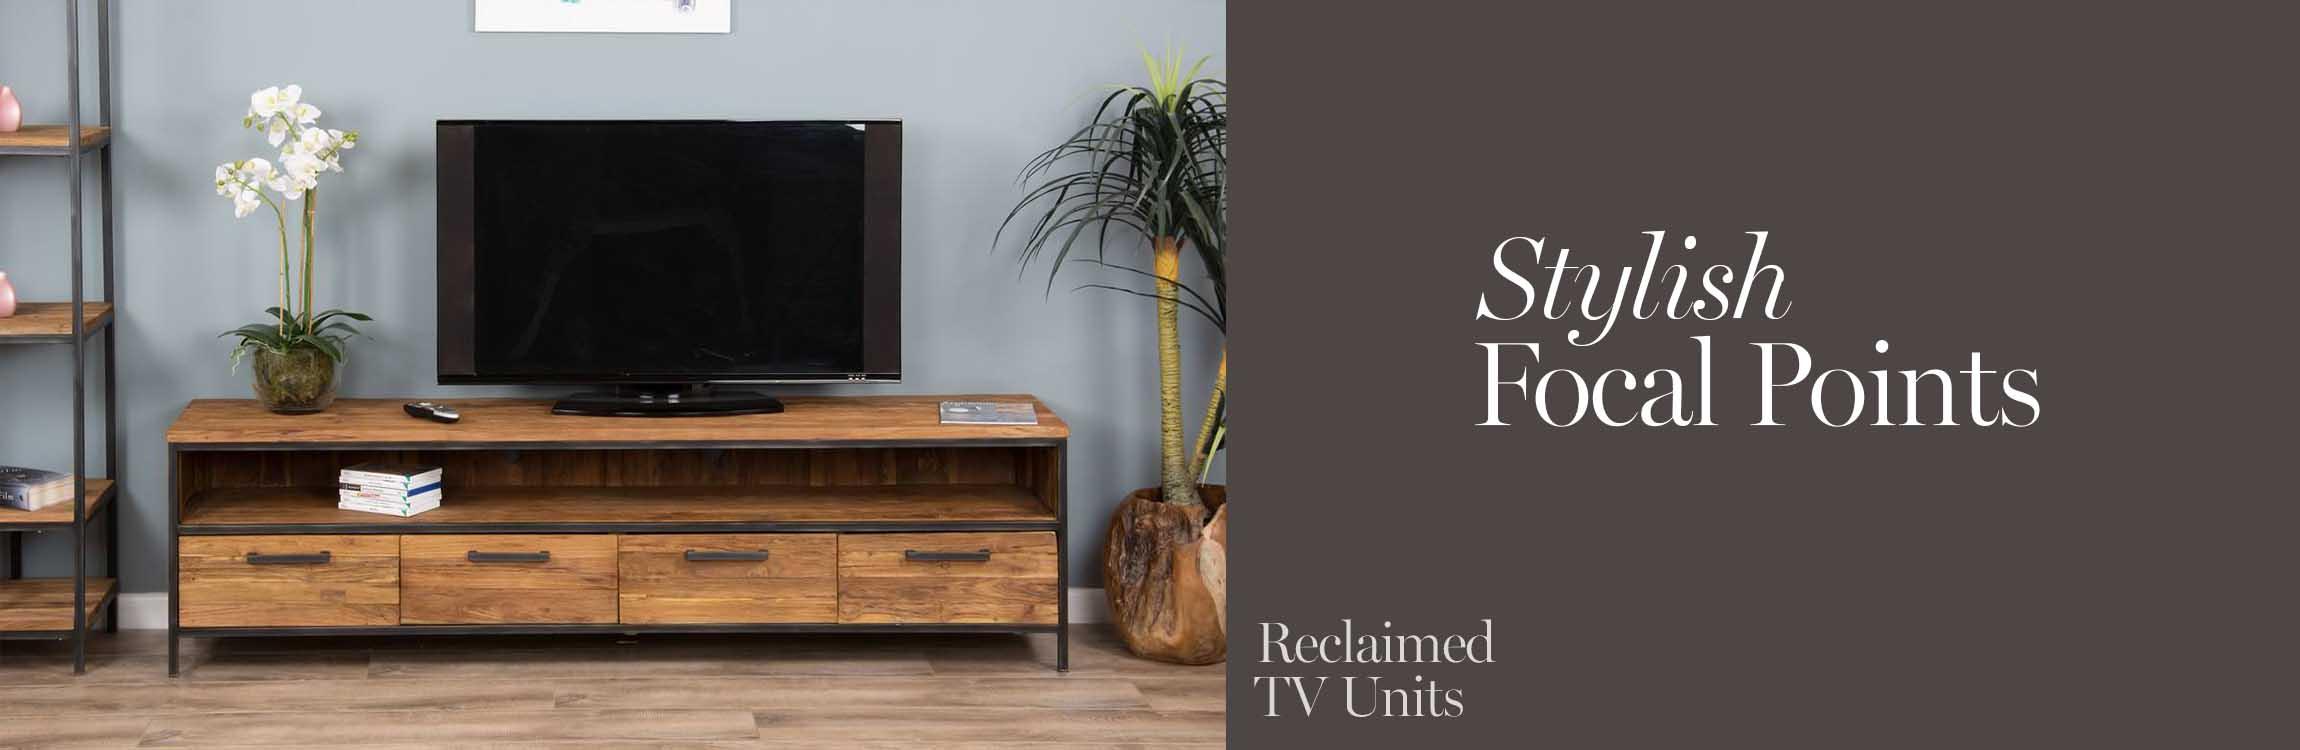 Reclaimed TV units